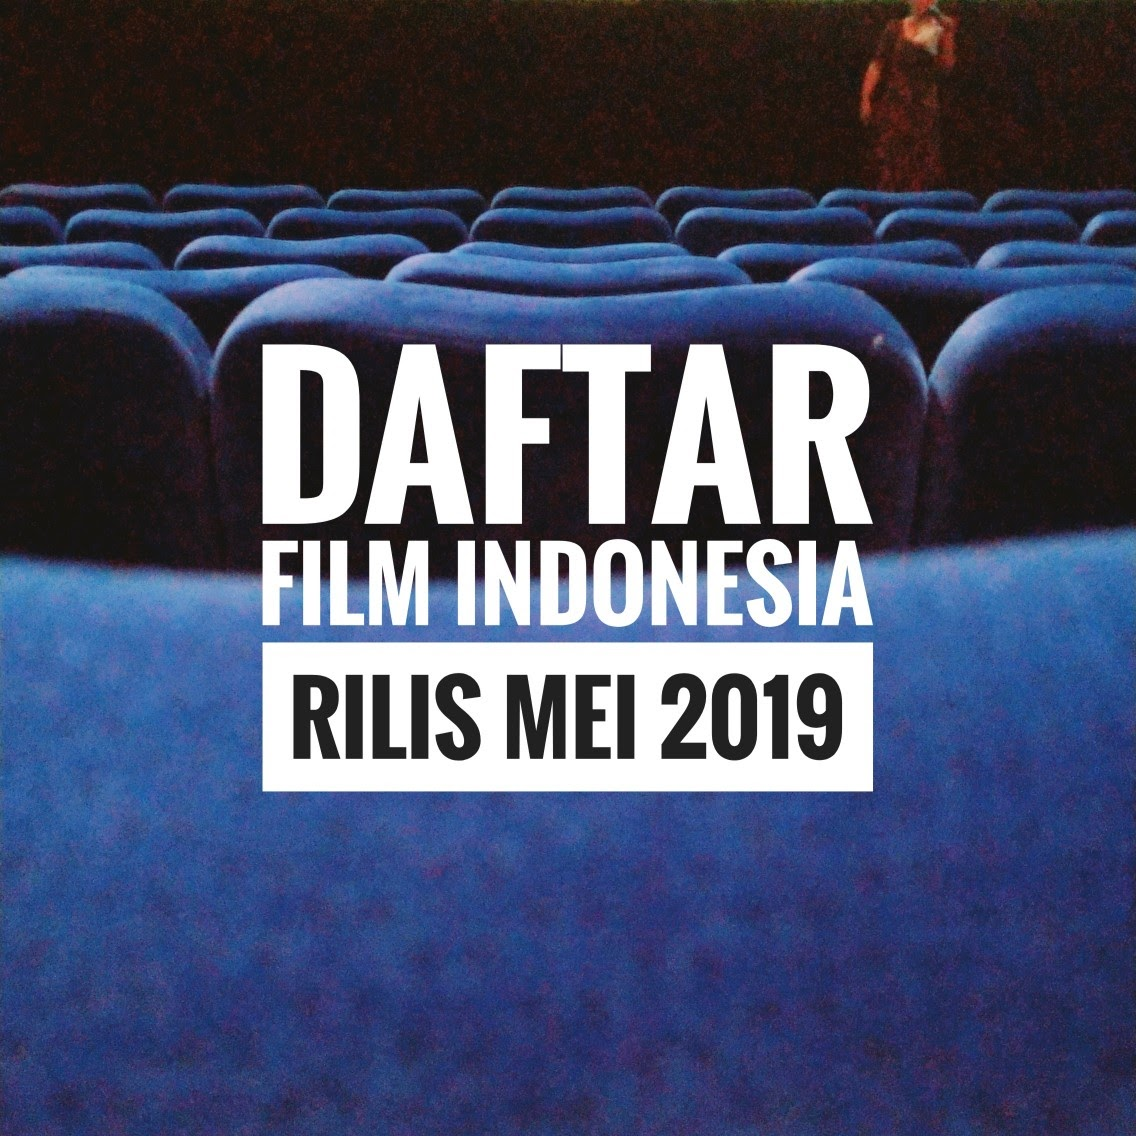 Daftar Film Indonesia yang Rilis Bulan Mei 2019